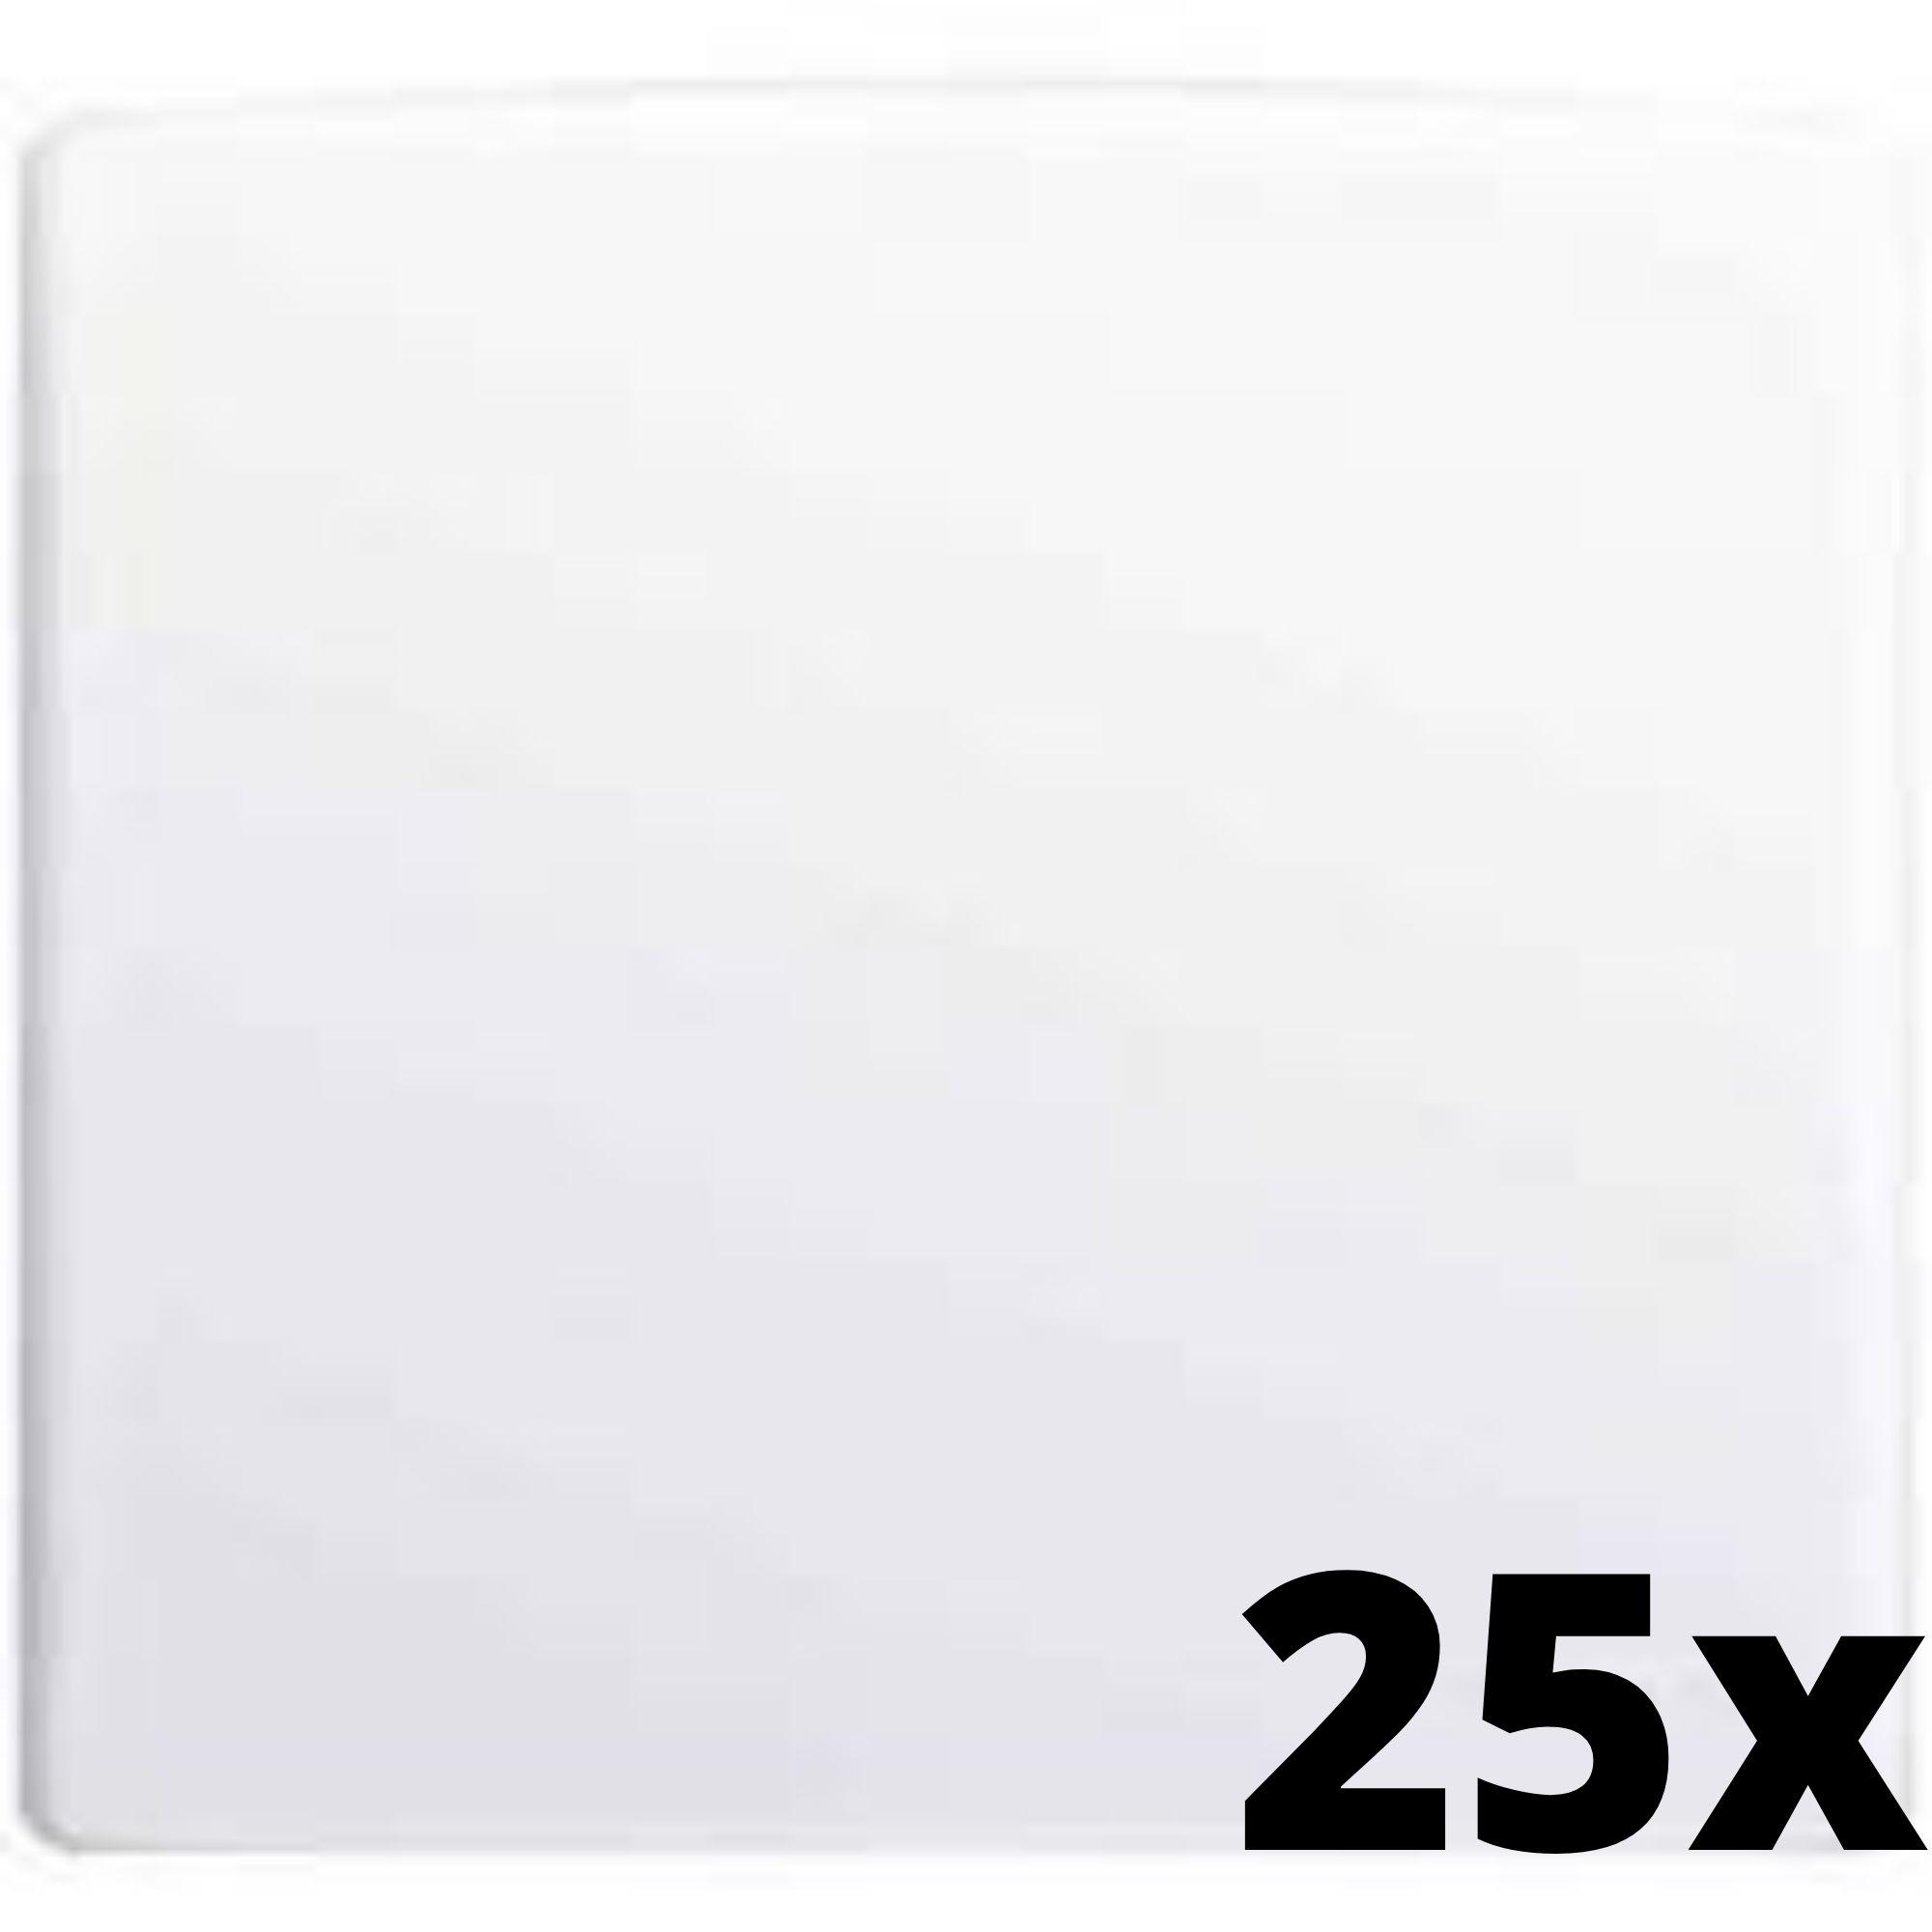 Kit 25 und Alumbra Bianco Pró Placa 4x4 Cega